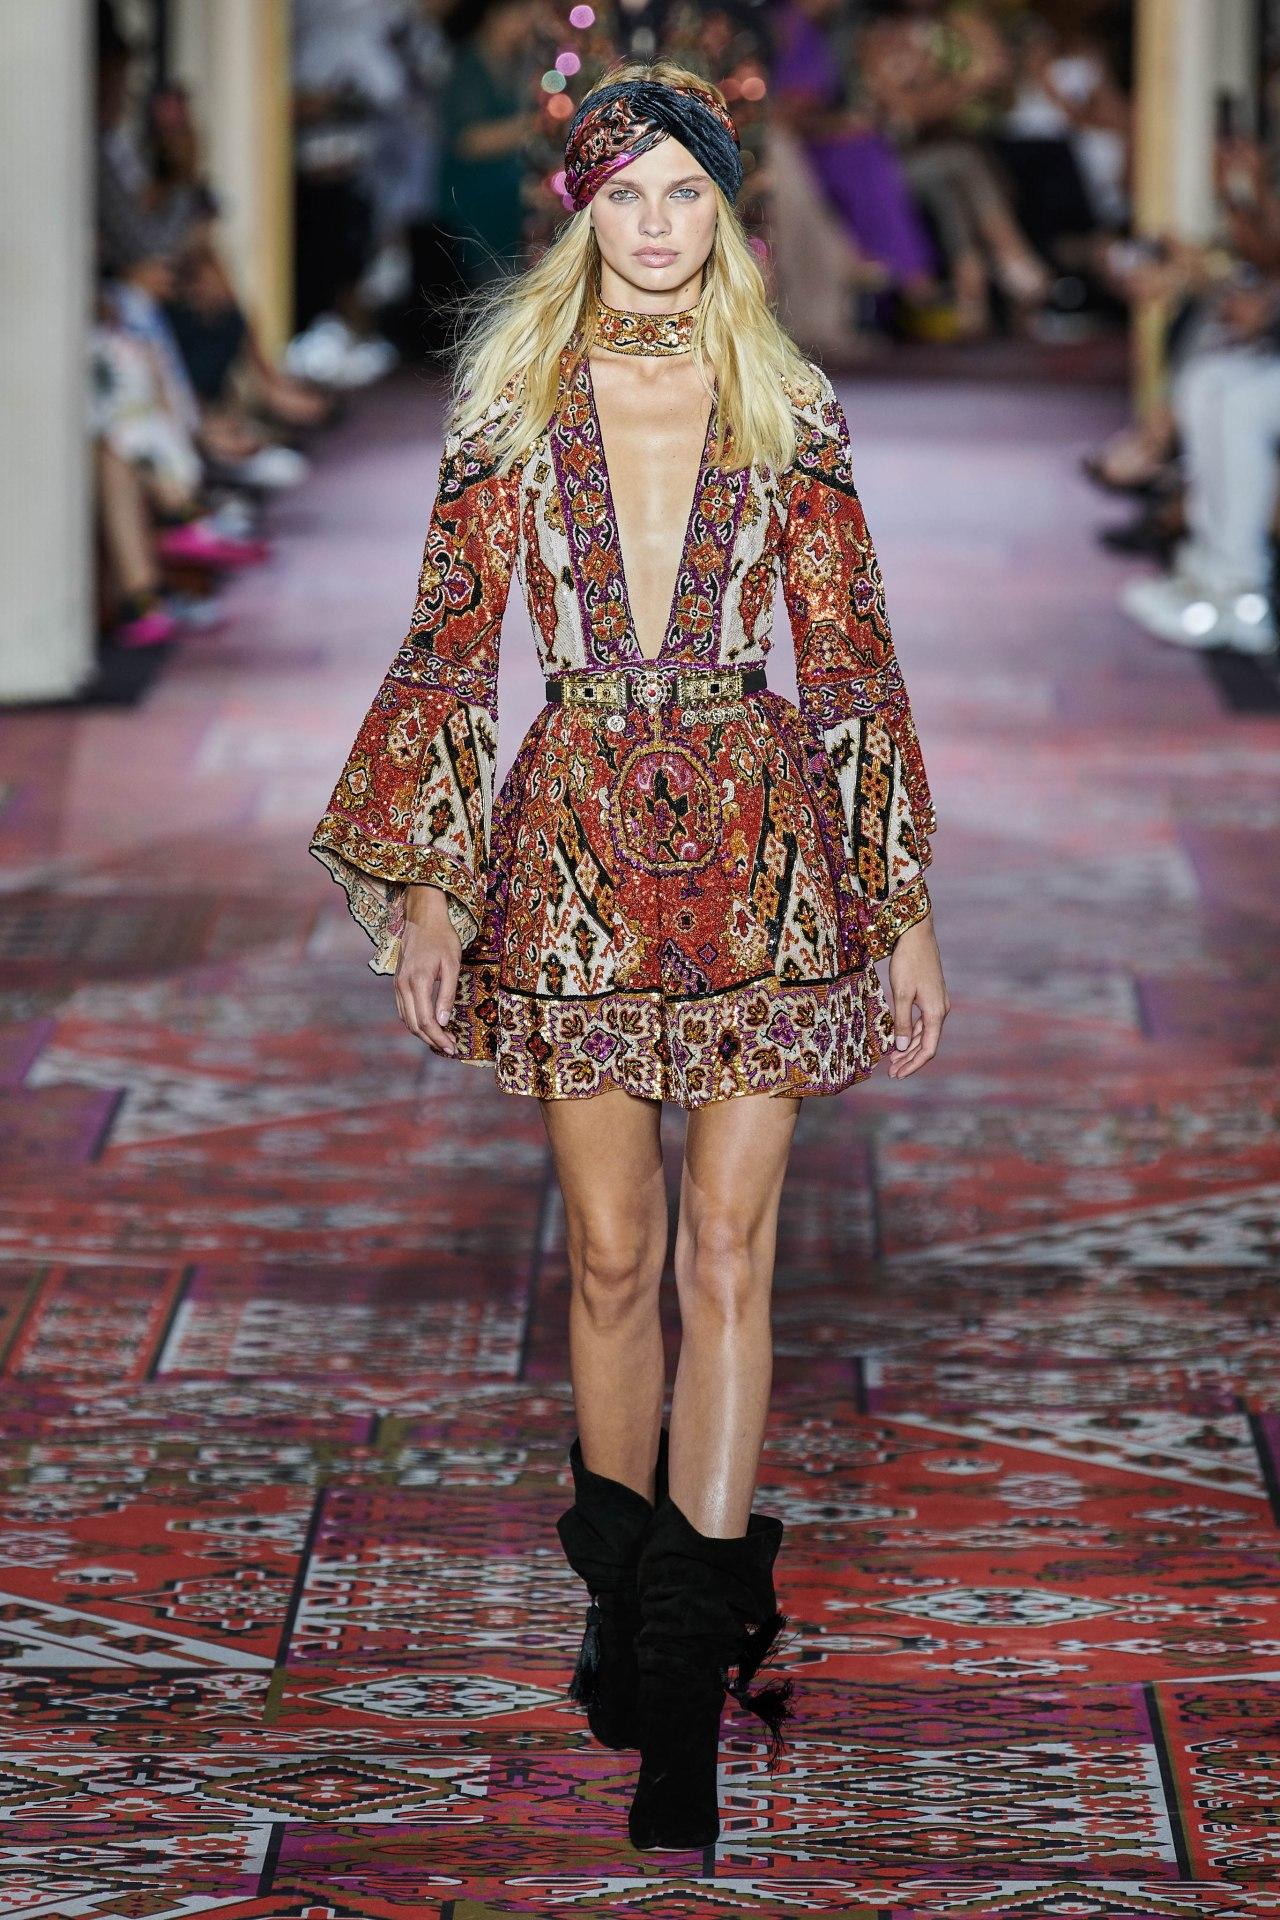 Zuhair Murad haute couture autumn/winter '19/'20